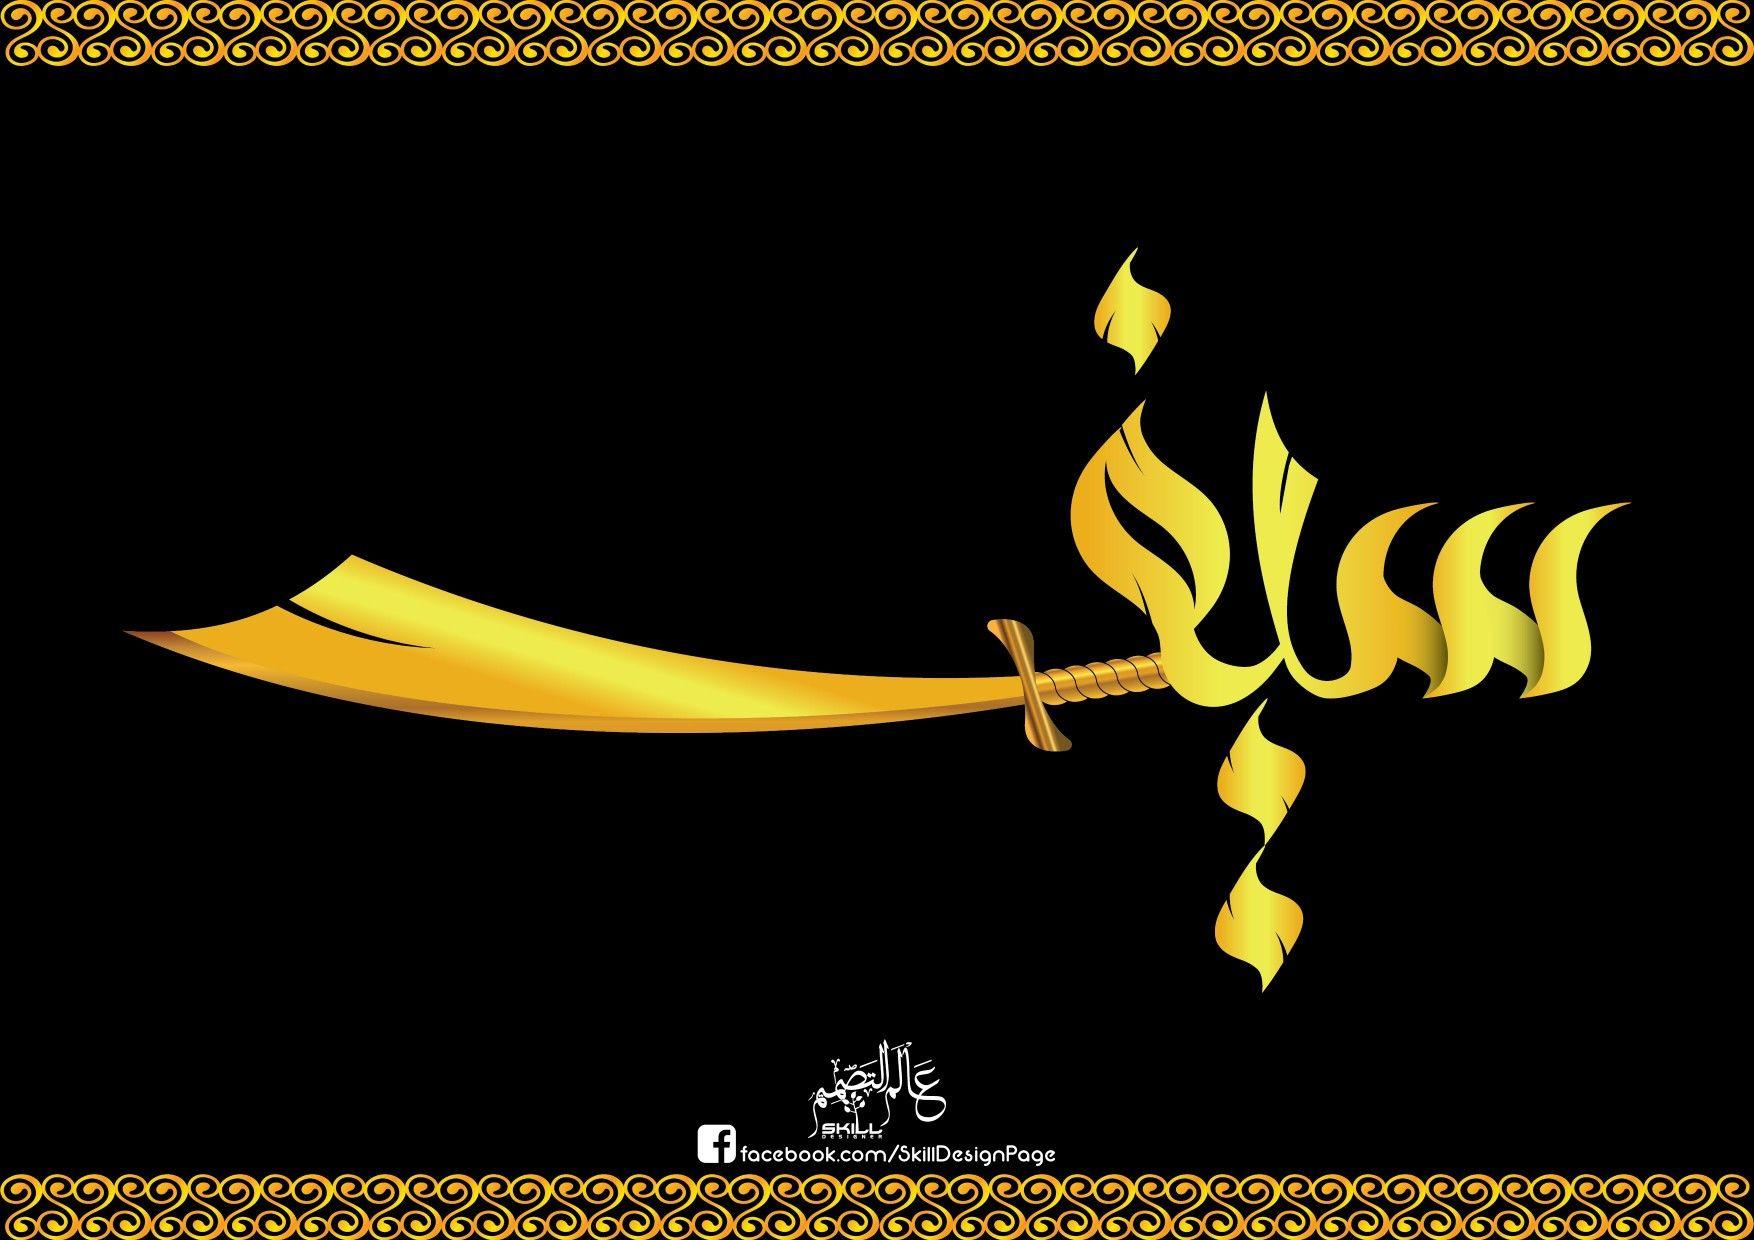 سيف Logodesign Logodesinger Typography Calligraphy Graphic Design Arabic Names Arabic Calligraphy Arabic Typography Poster Logo Design Calligraphy Name